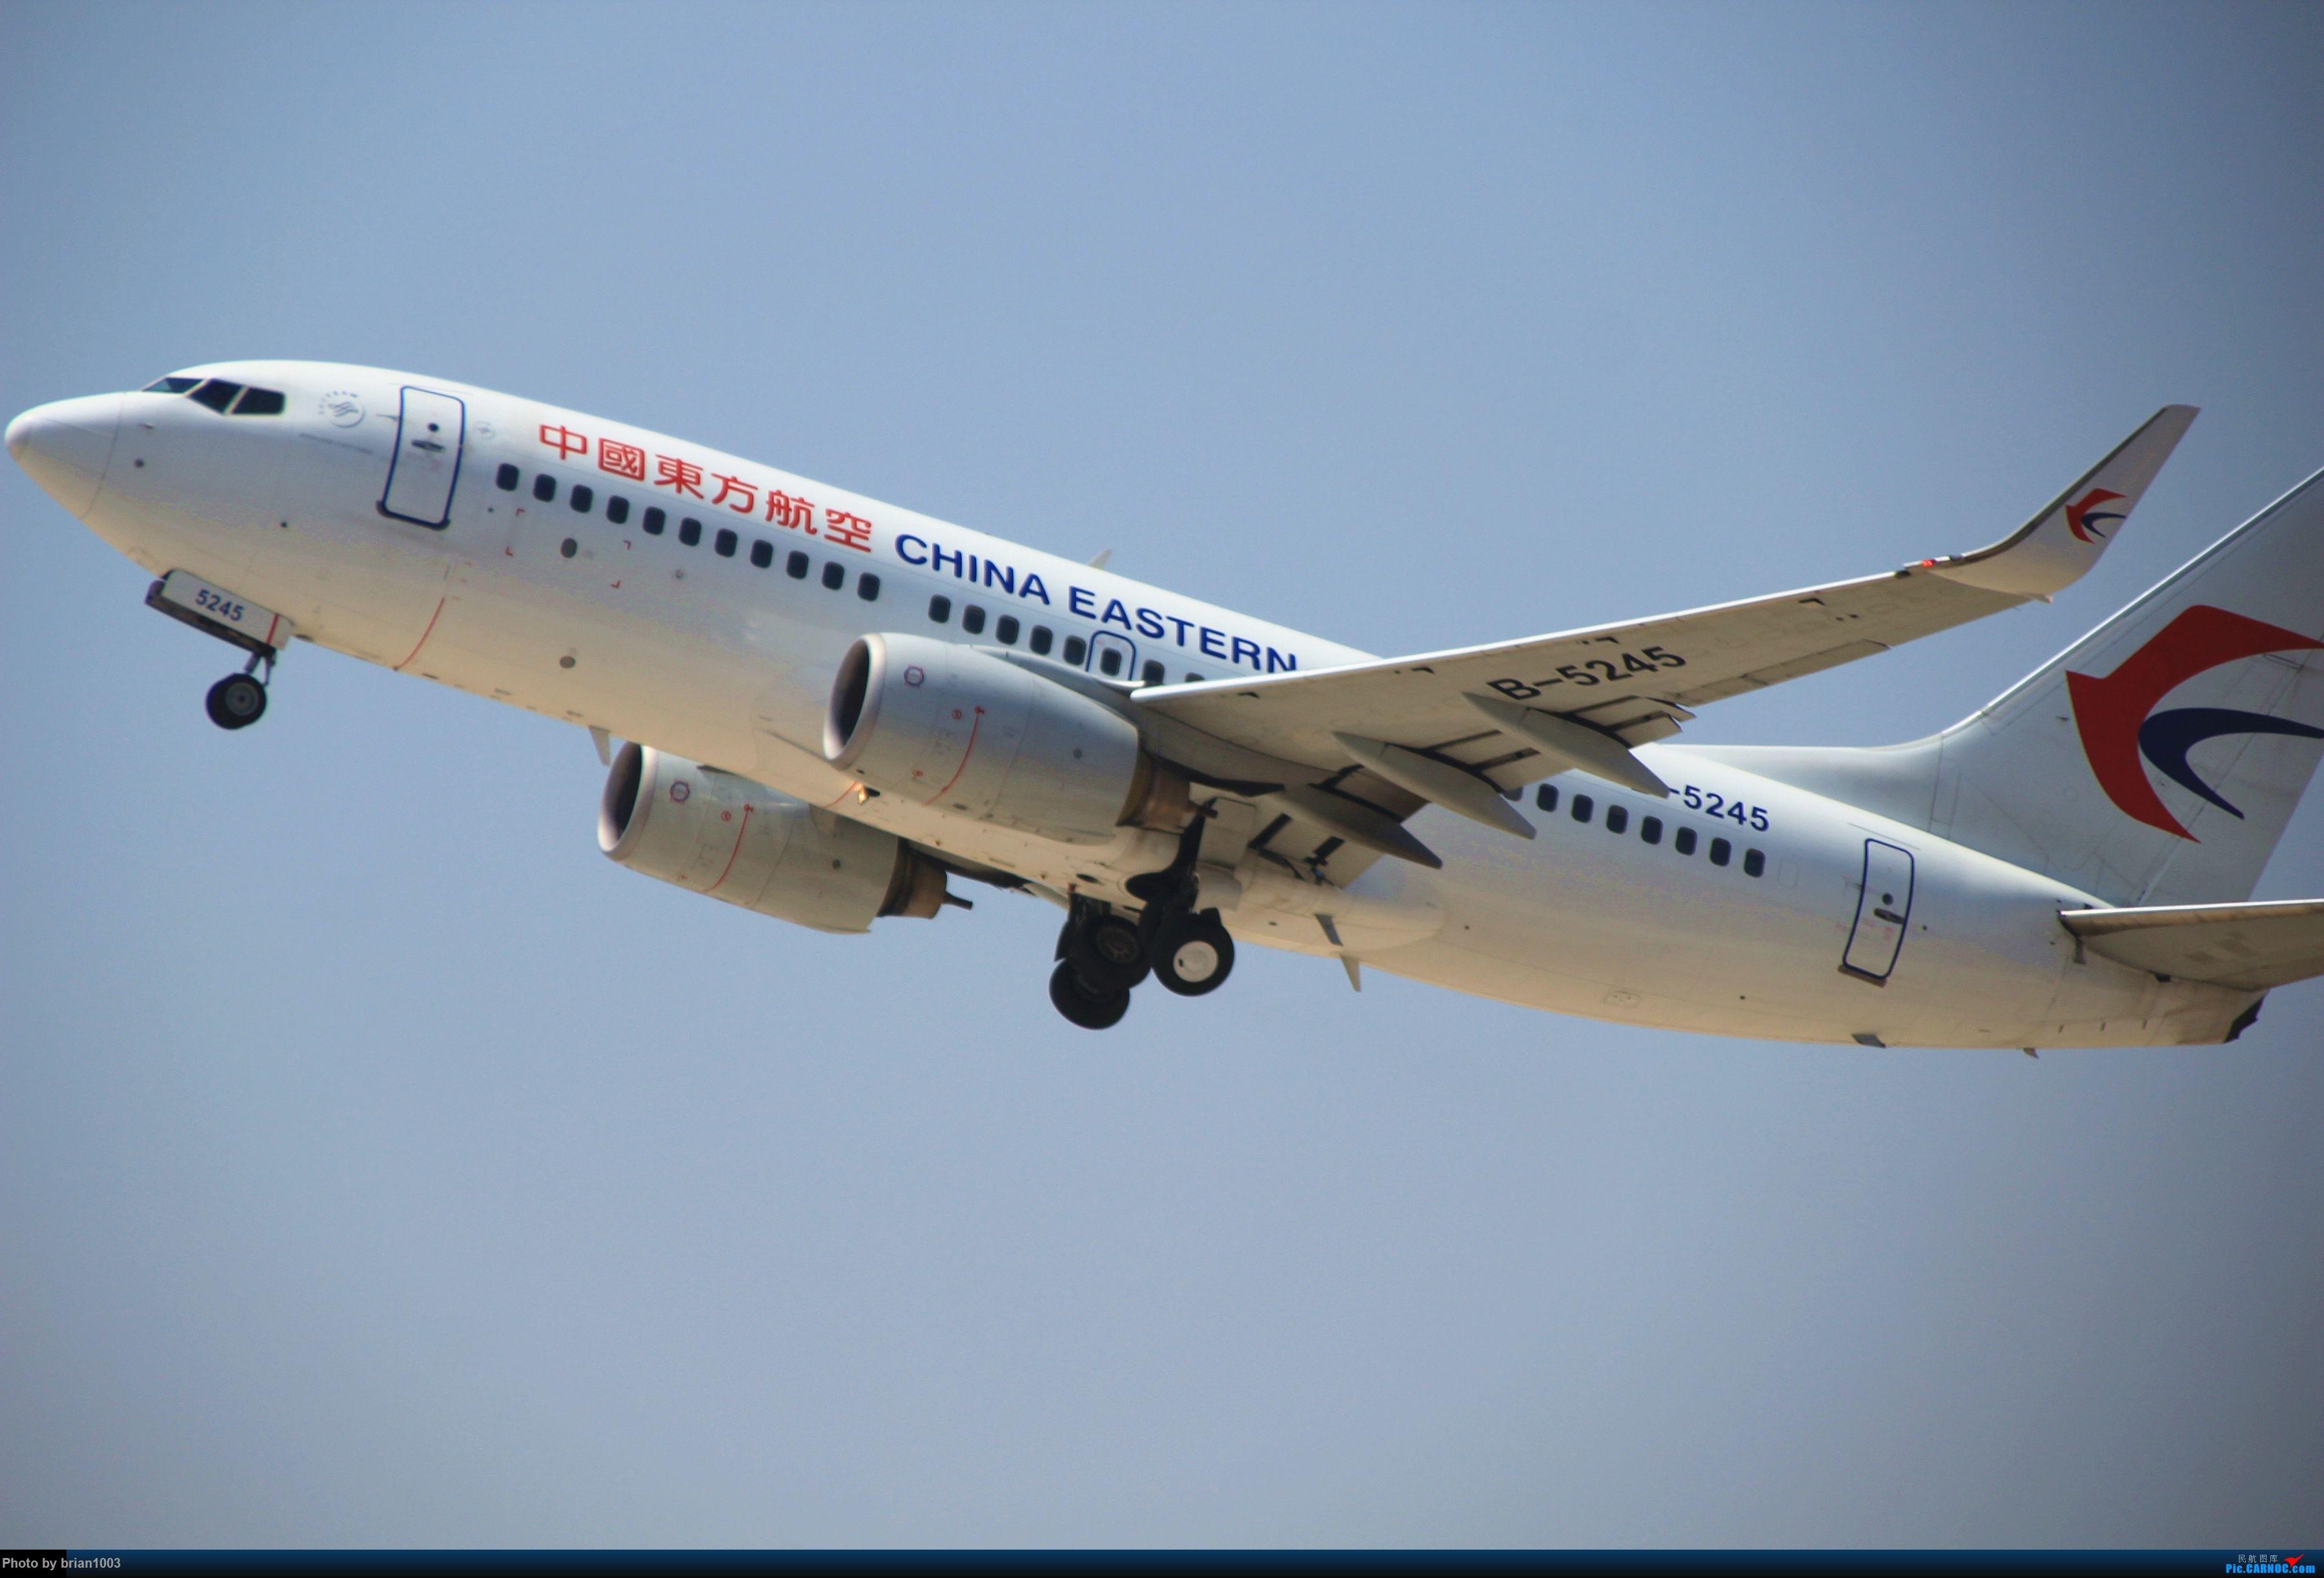 Re:[原创]WUH武汉天河机场拍机之喜迎酷航788和偶遇某其他飞机 BOEING 737-700 B-5245